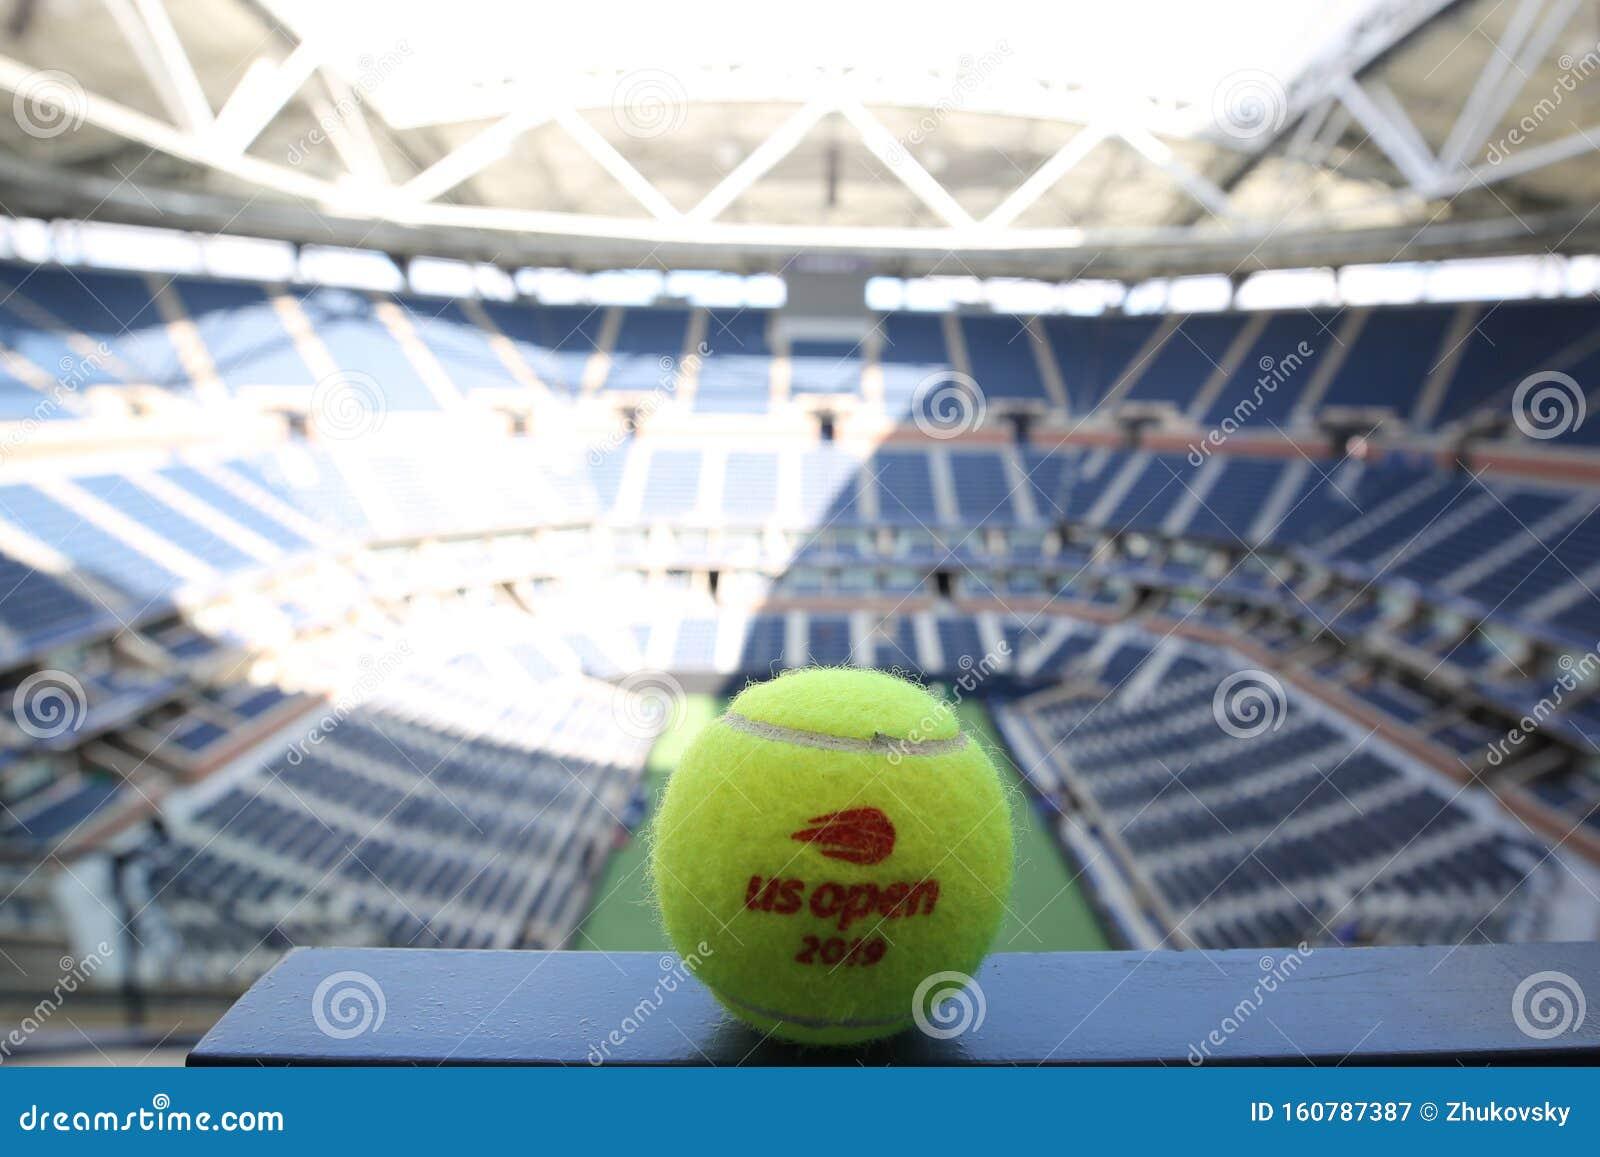 US Open Wilson Tennisball Im Billie Jean King National